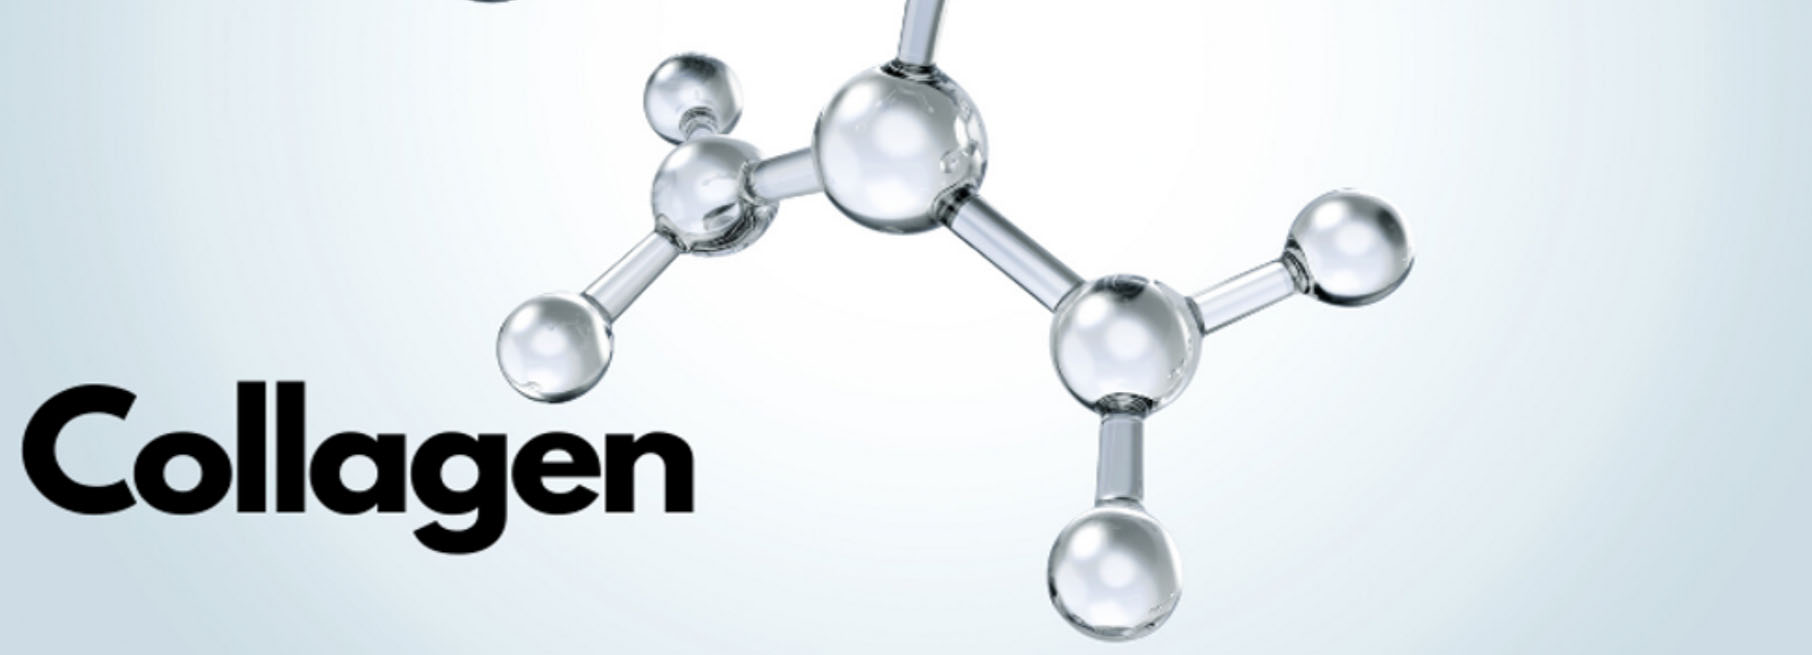 collagen large image